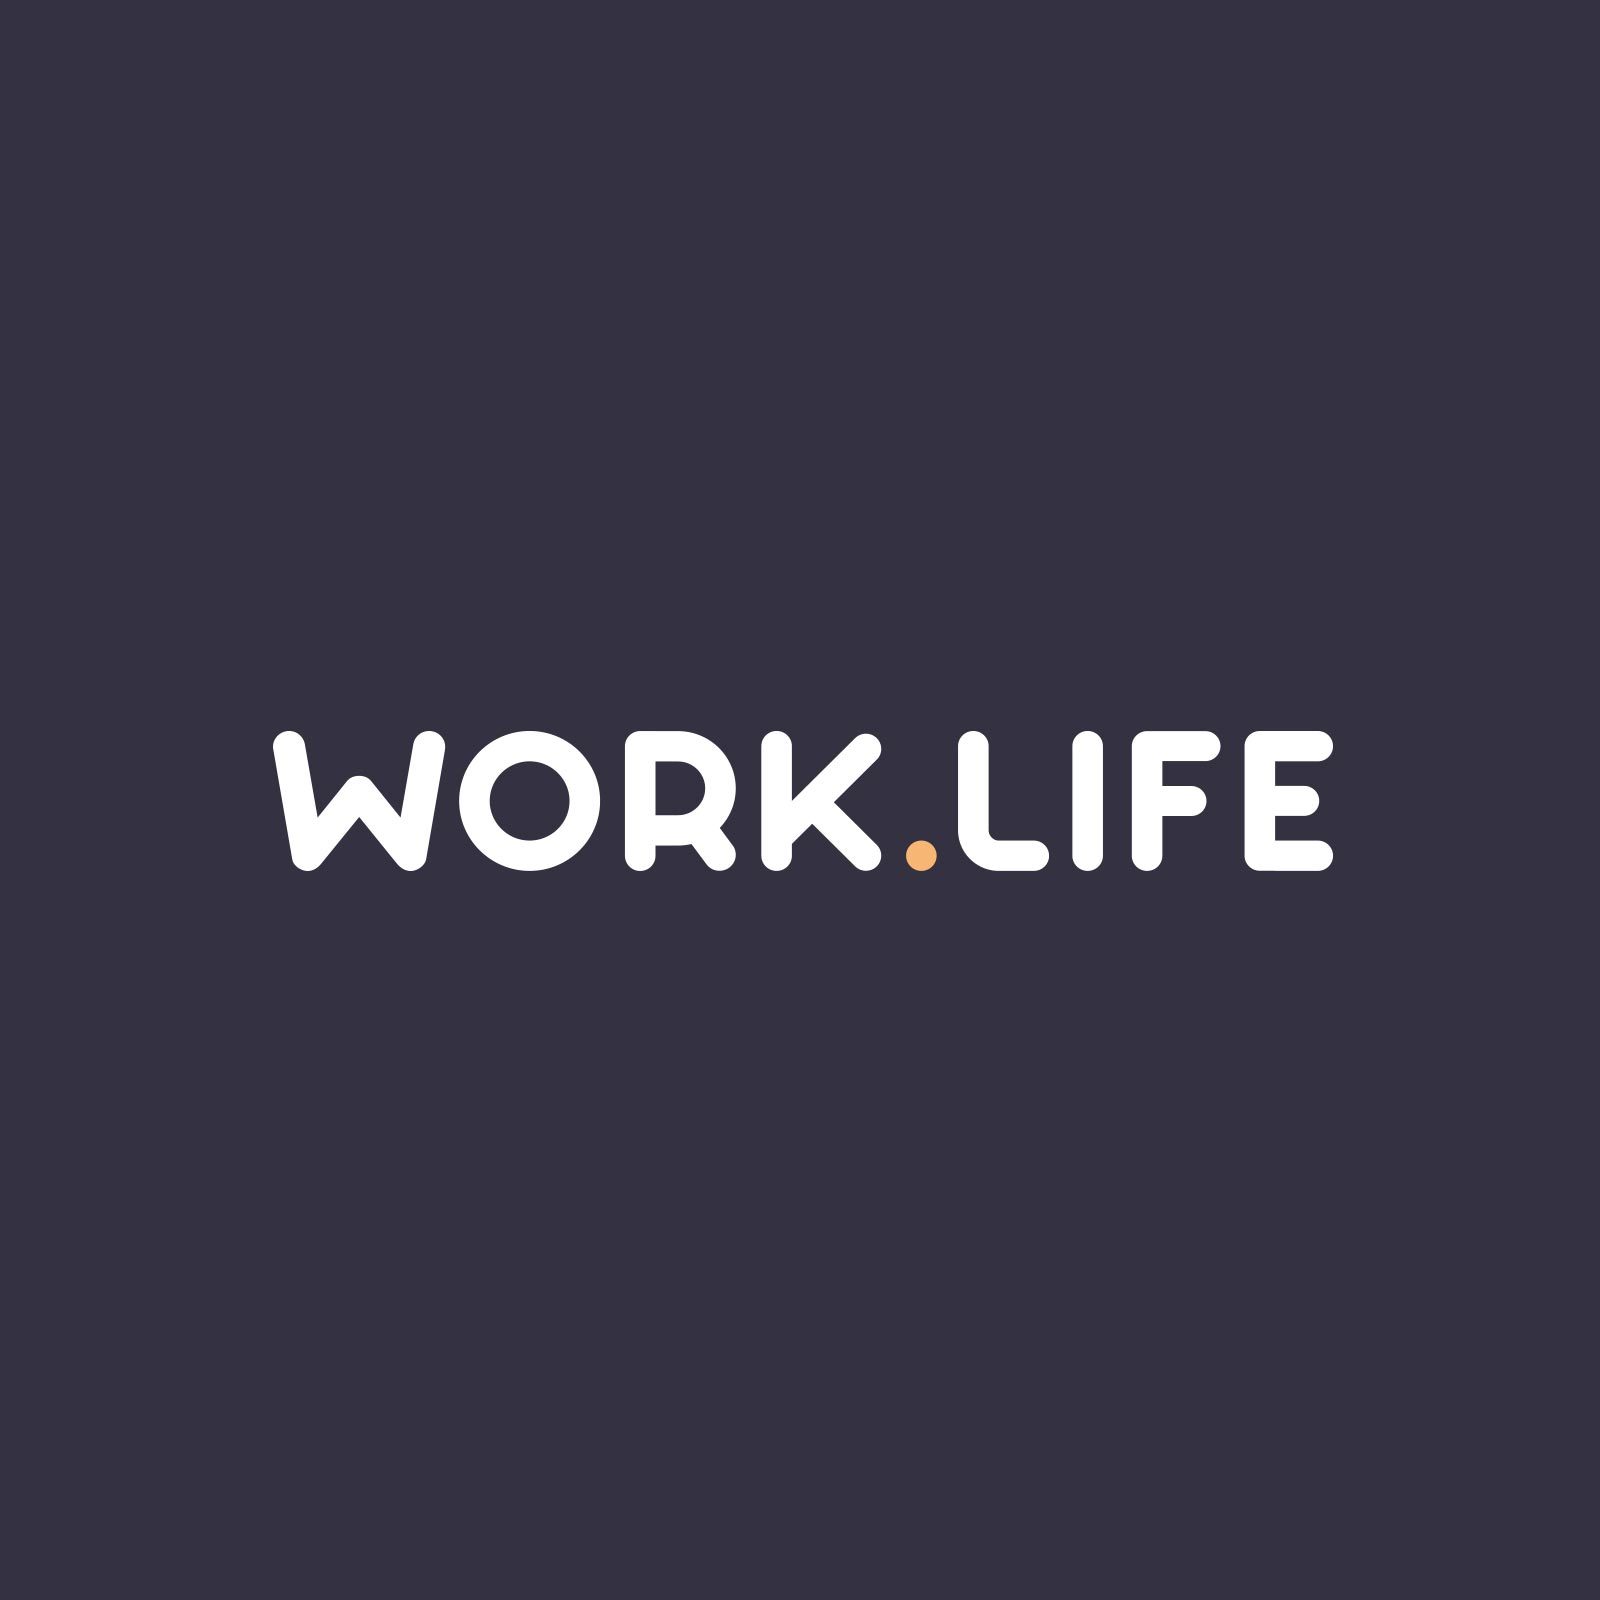 Work-life_logo.jpg